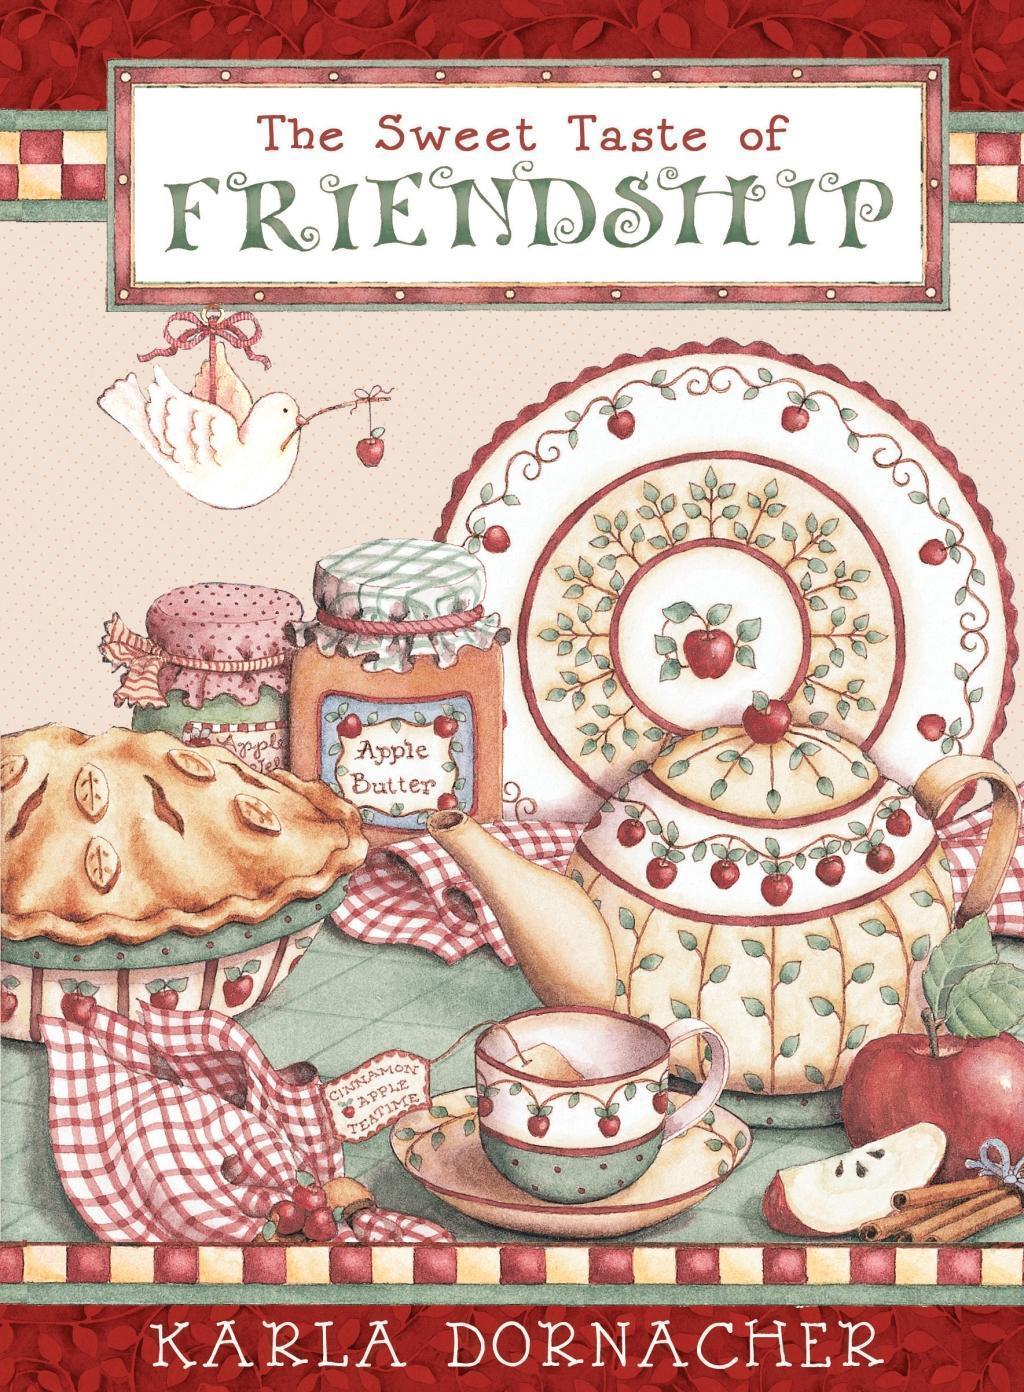 The Sweet Taste of Friendship